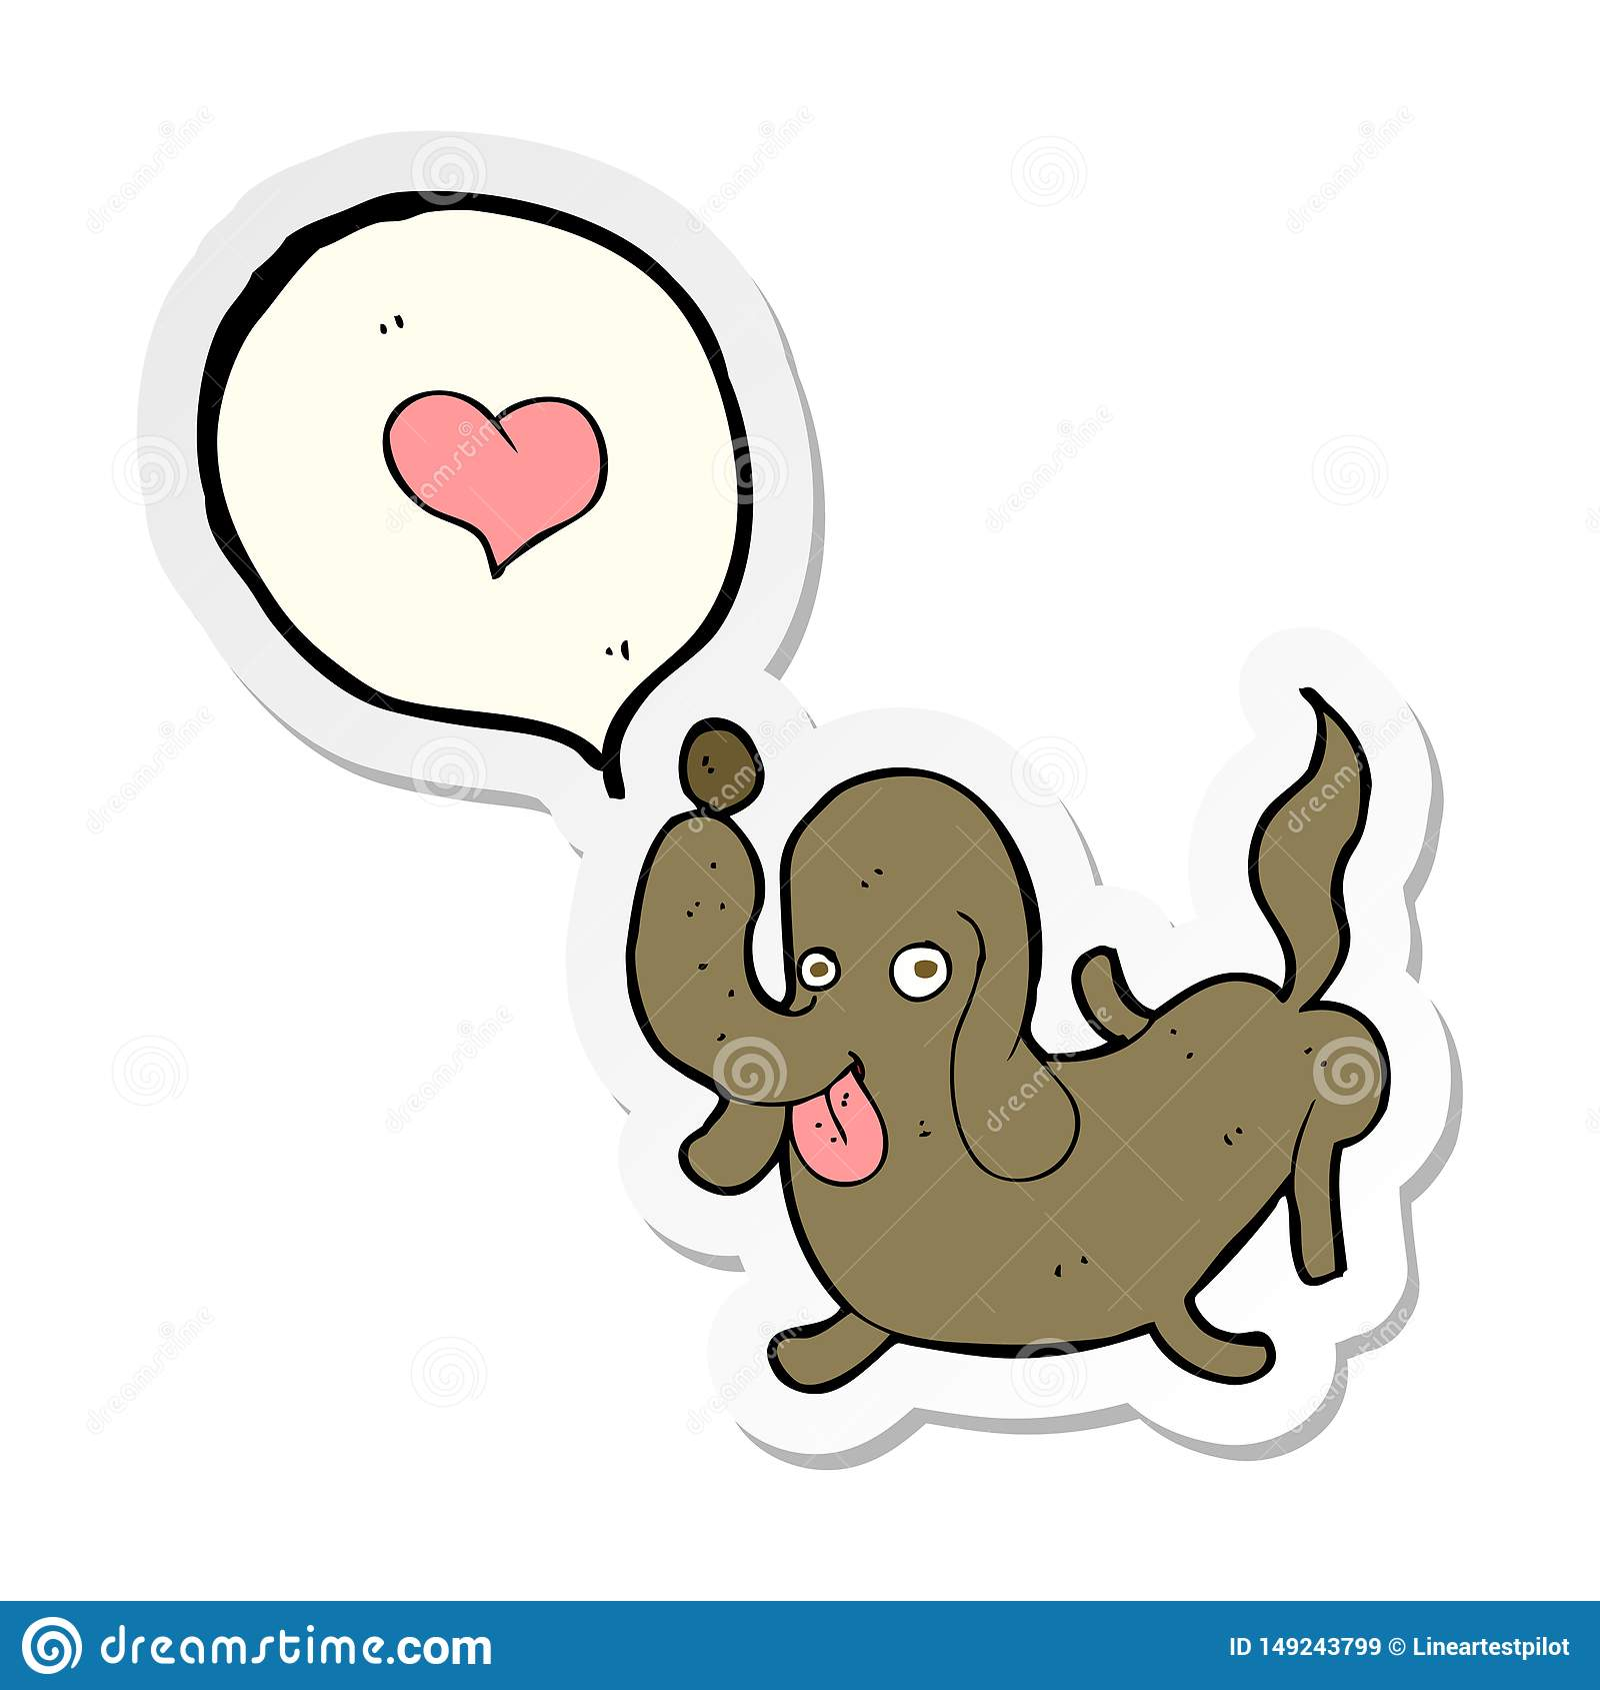 Sticker Of A Cartoon Dog With Love Heart Stock Vector ...